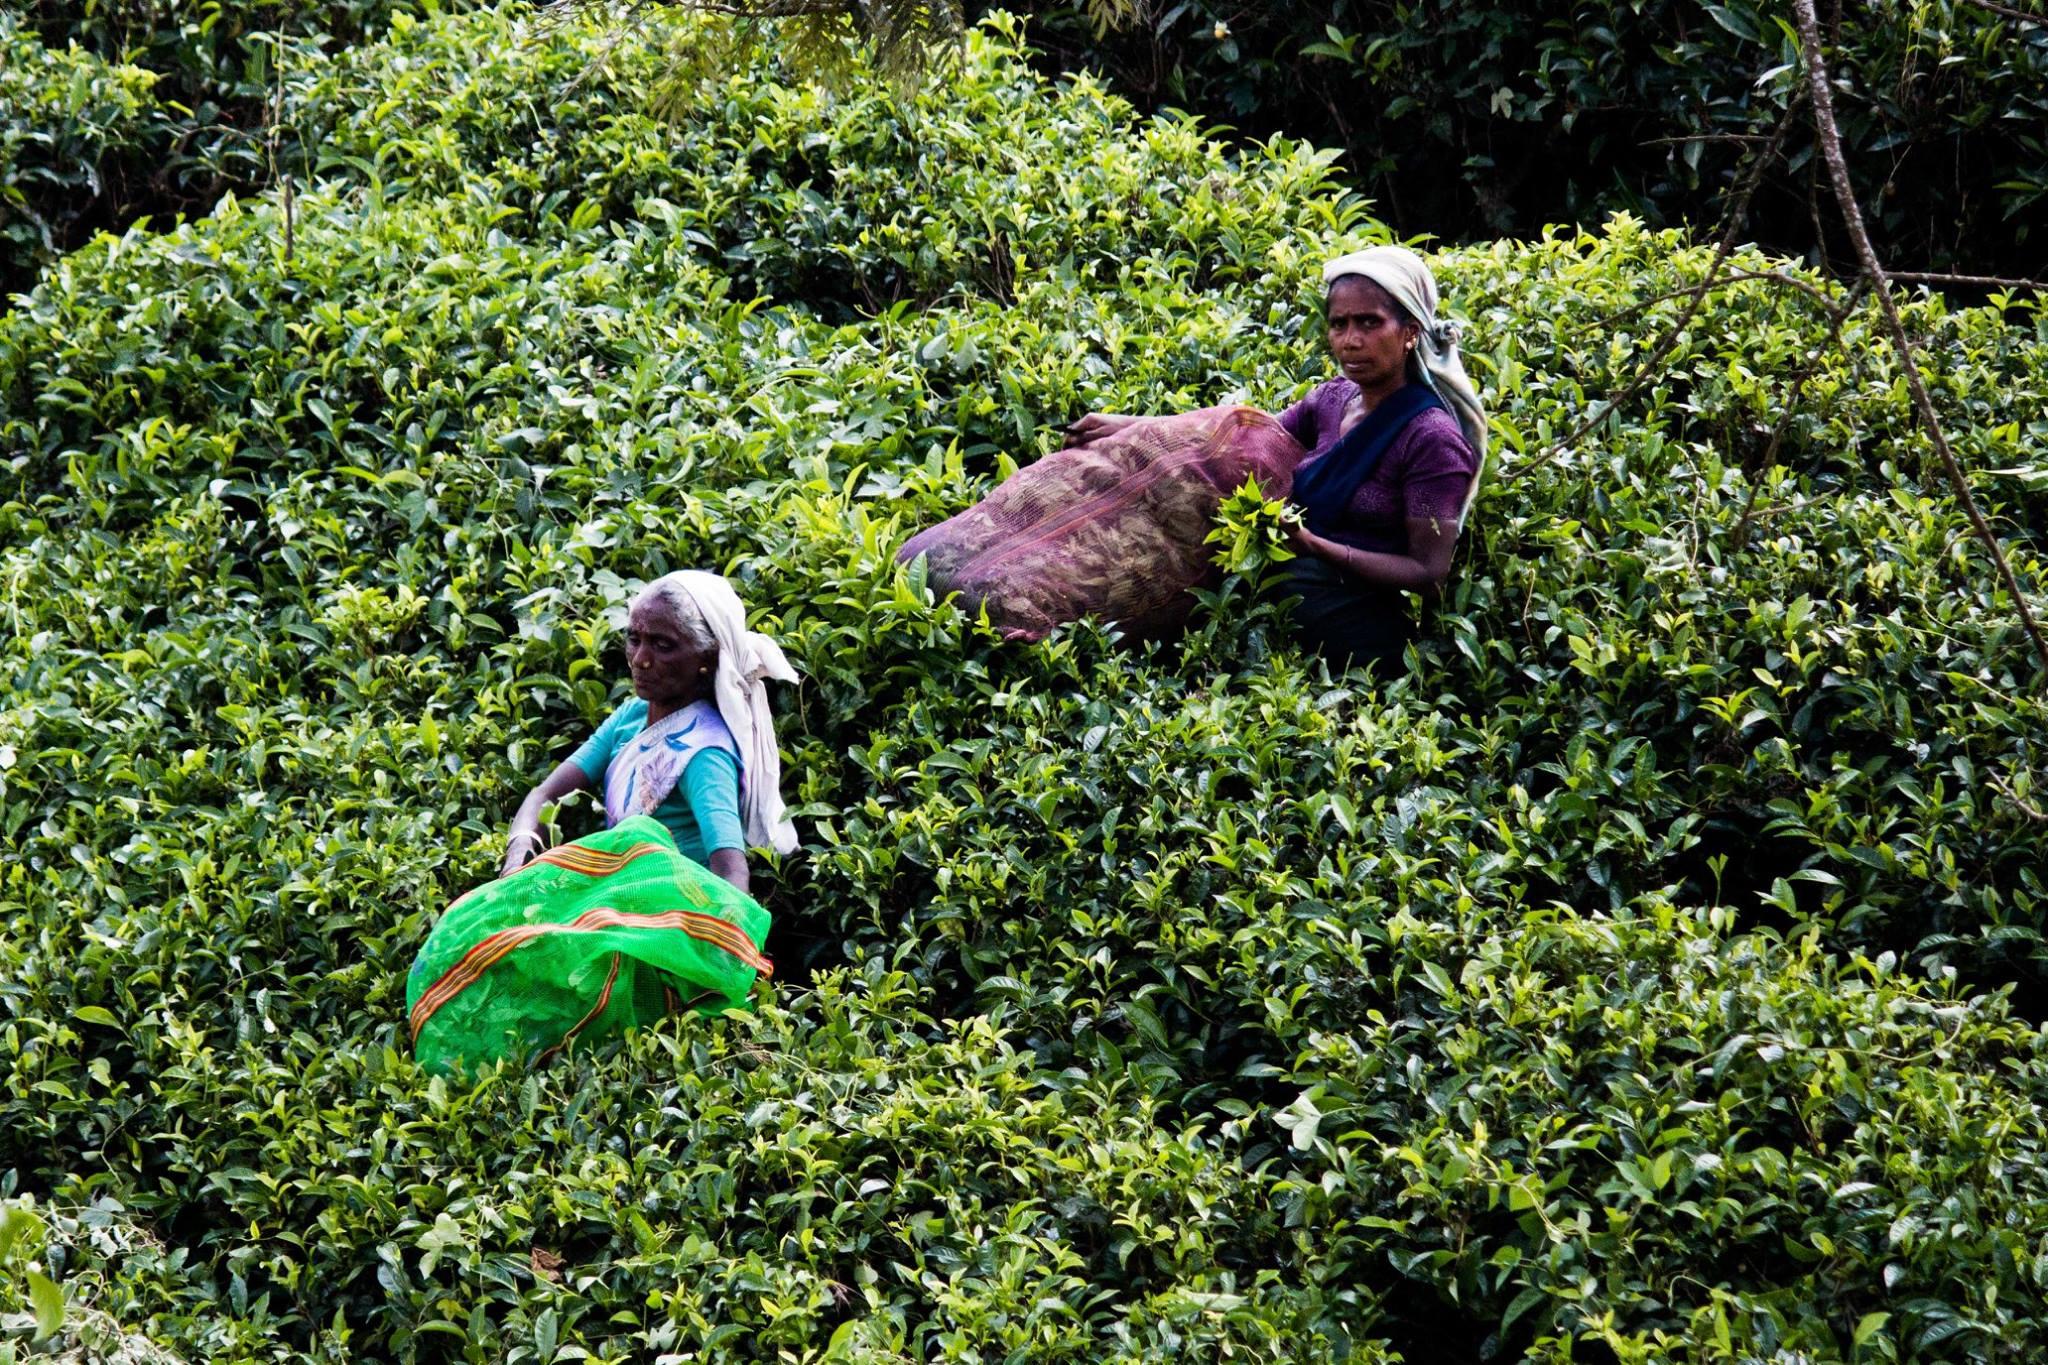 invite-to-paradise-sri-lanka-and-maldives-specialists-travel-agent-tour-operator-customer-review--feedback-joel-rhian-tea-pluckers-1.jpg